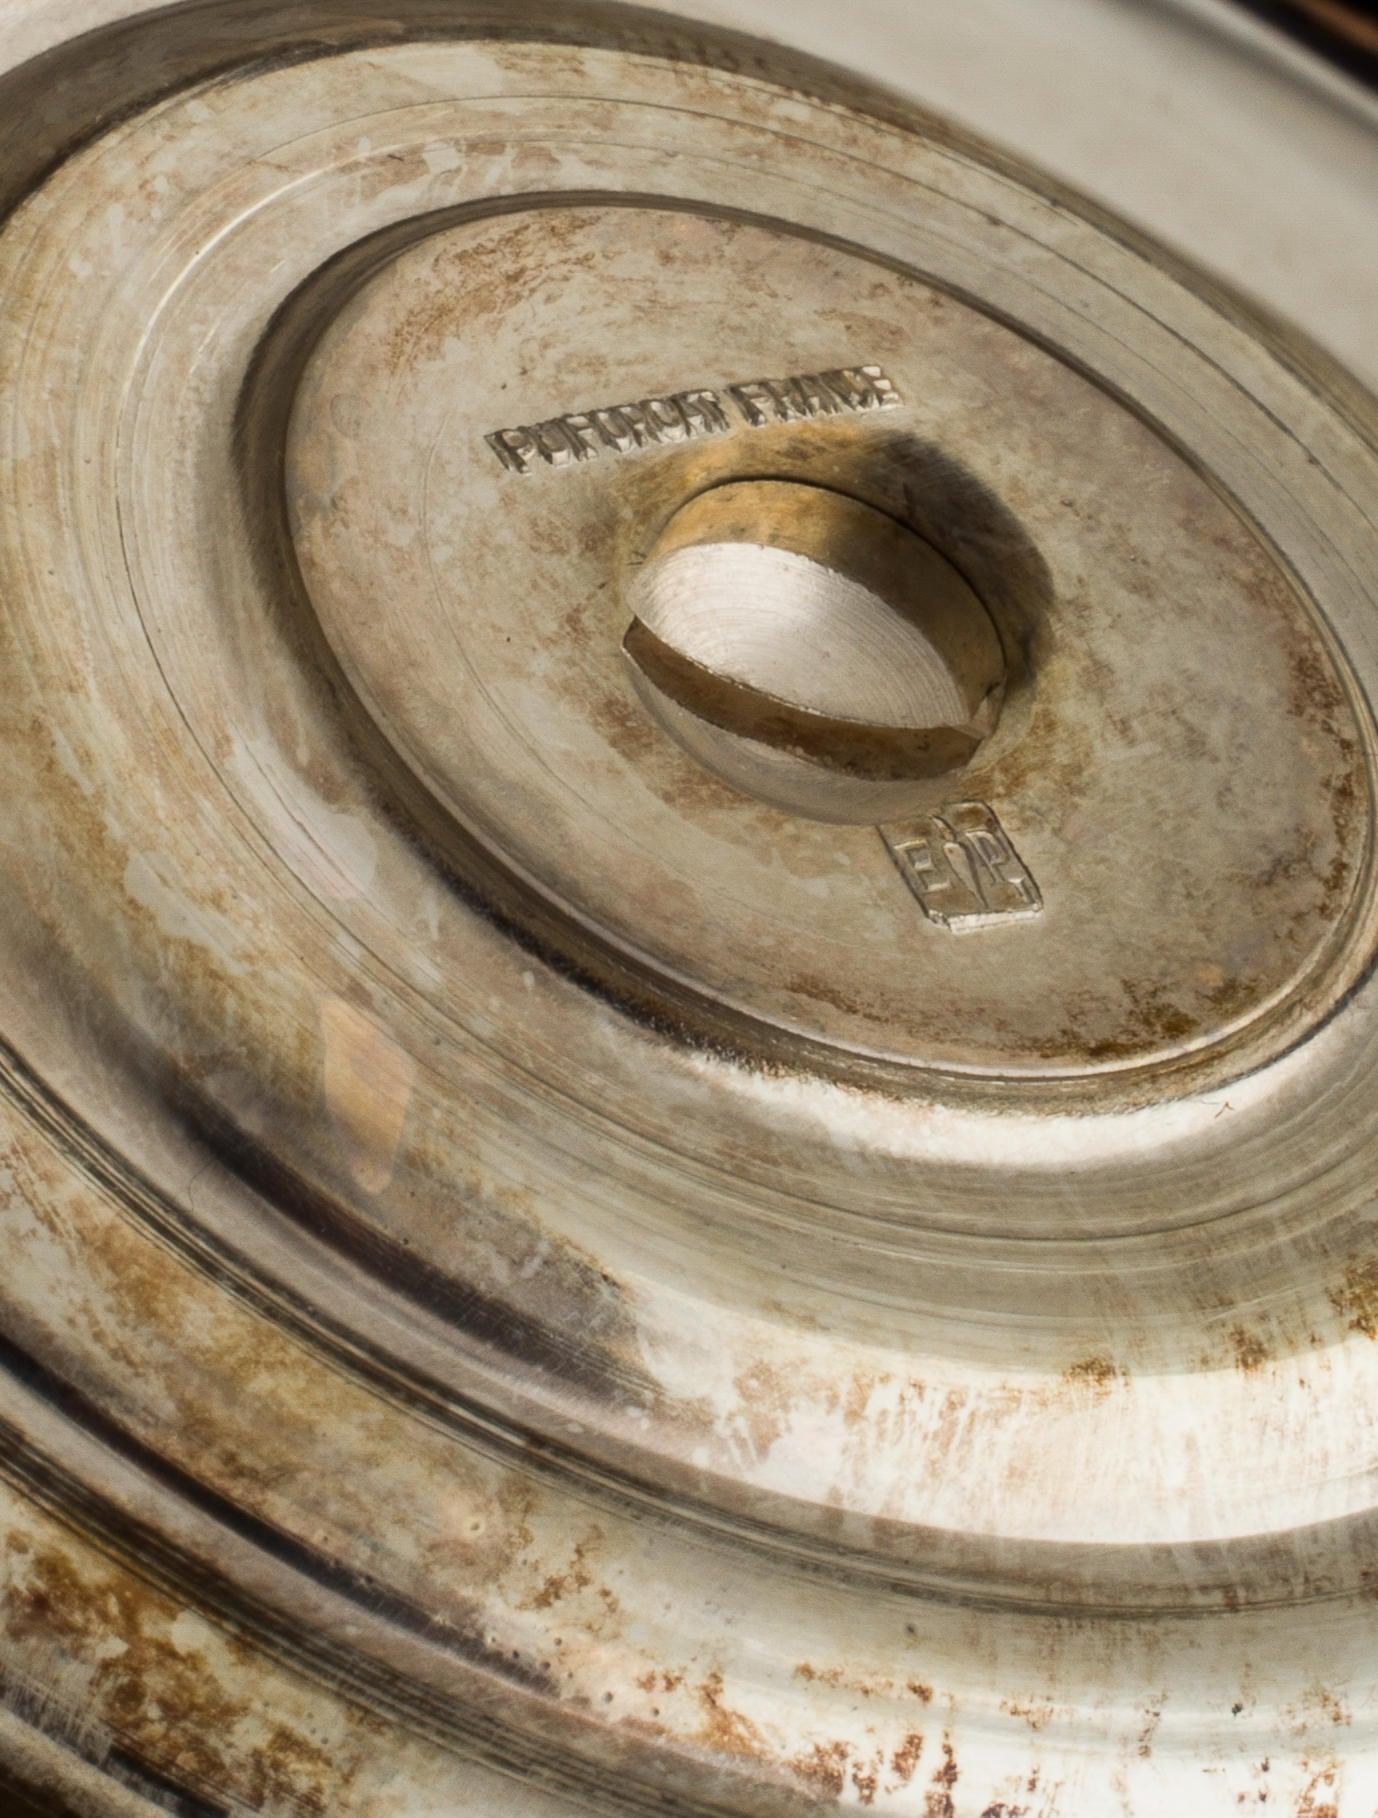 Puiforcat silver plate tazza bowl decor and accessories for Artistic accents genuine silver decoration